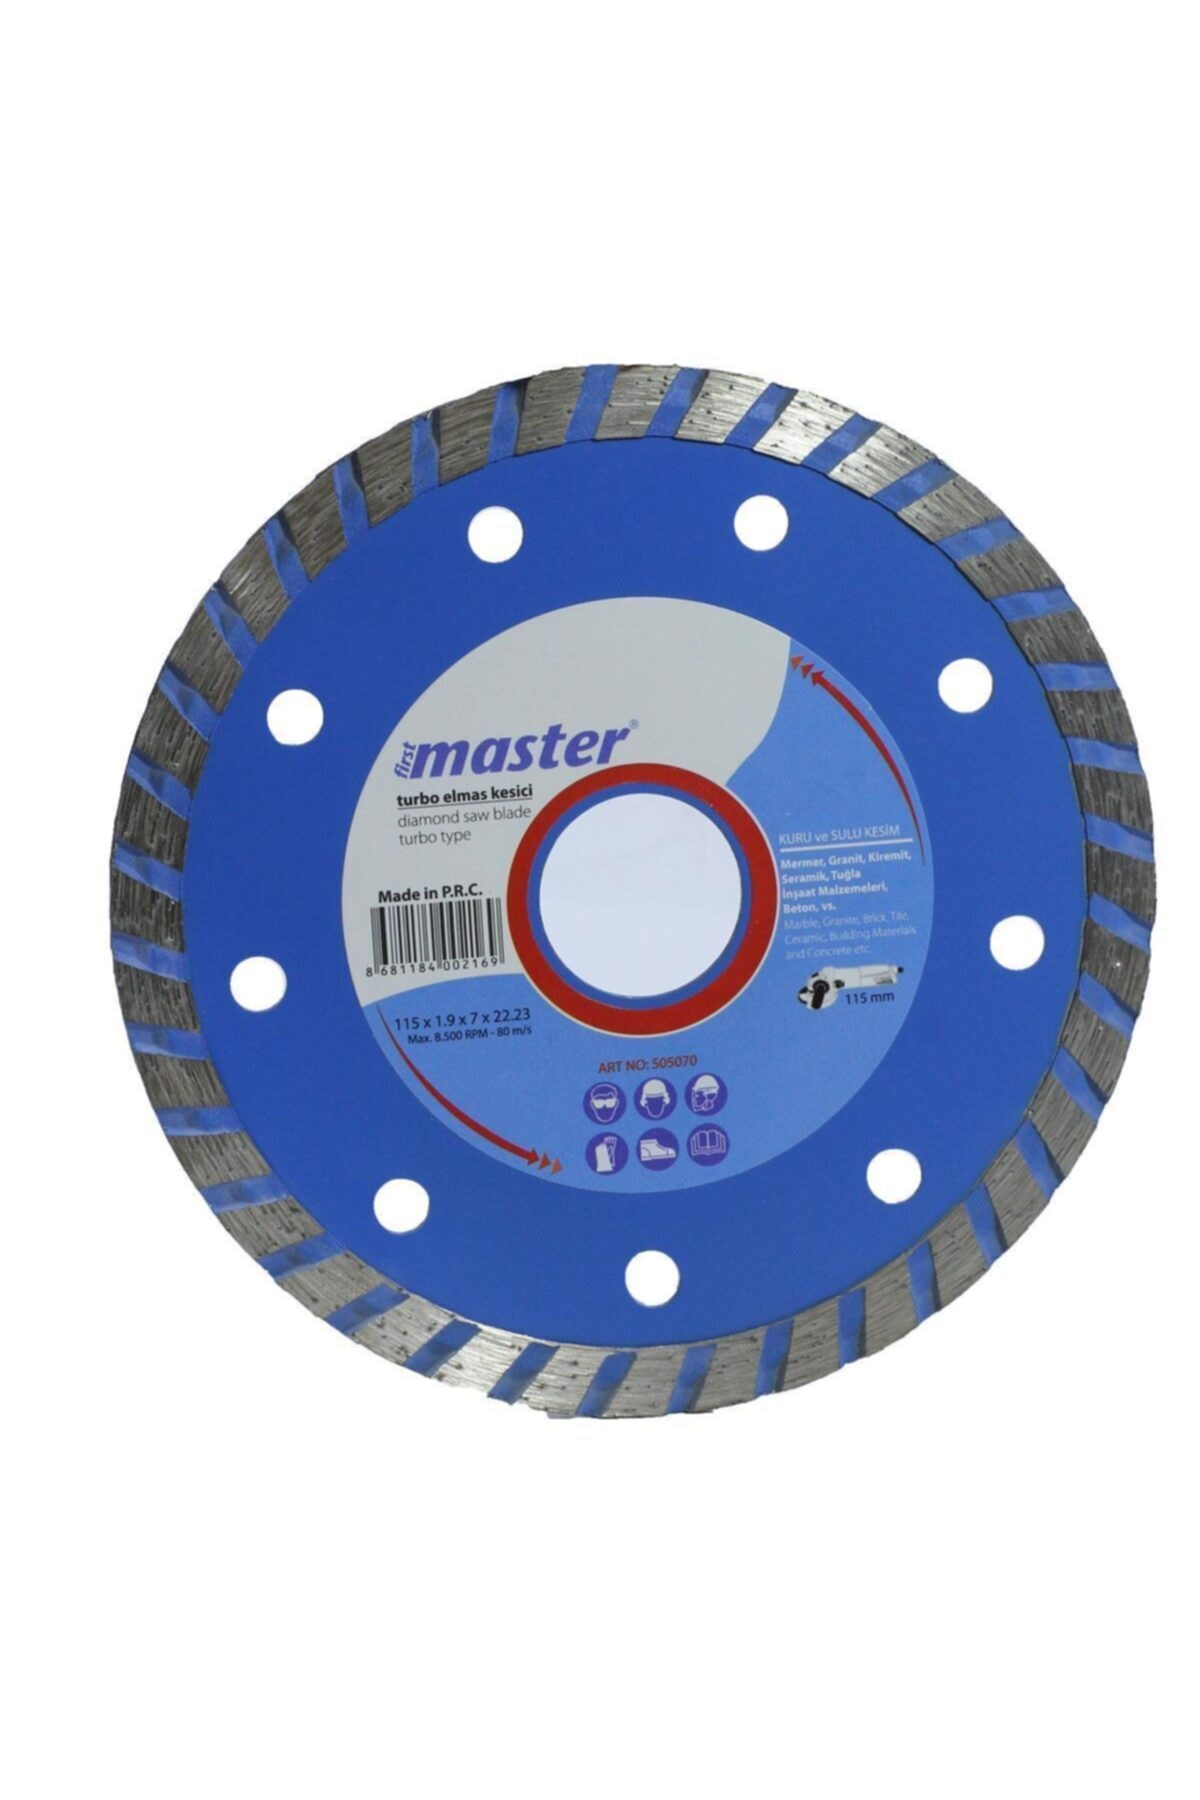 Badem10 Spiral Avuç Içi Taşlama Cırt Zımpara Flap Metal Kesici Diski Matkap Makinesi Seti 55 Parça 2